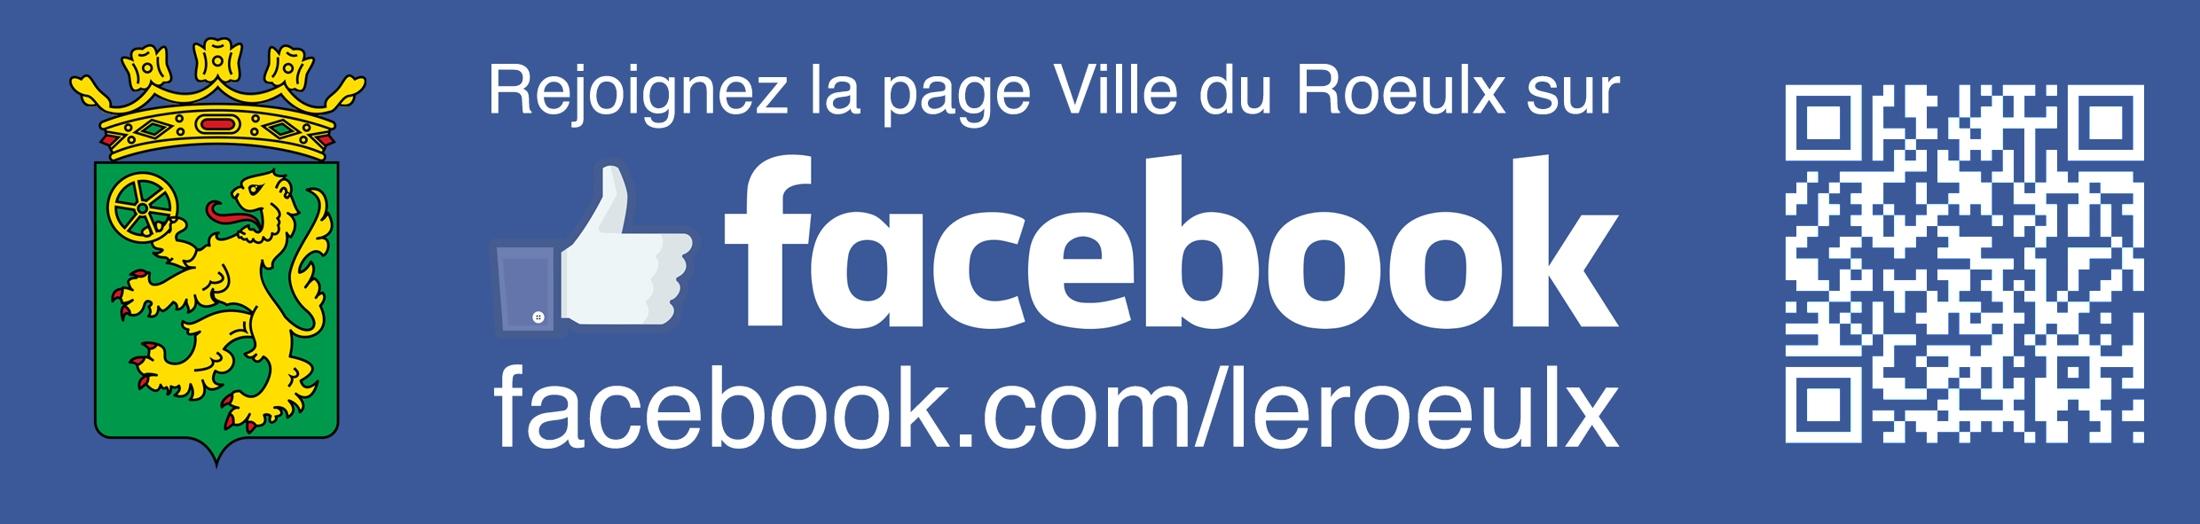 03 Banner promo FB Le Roeulx